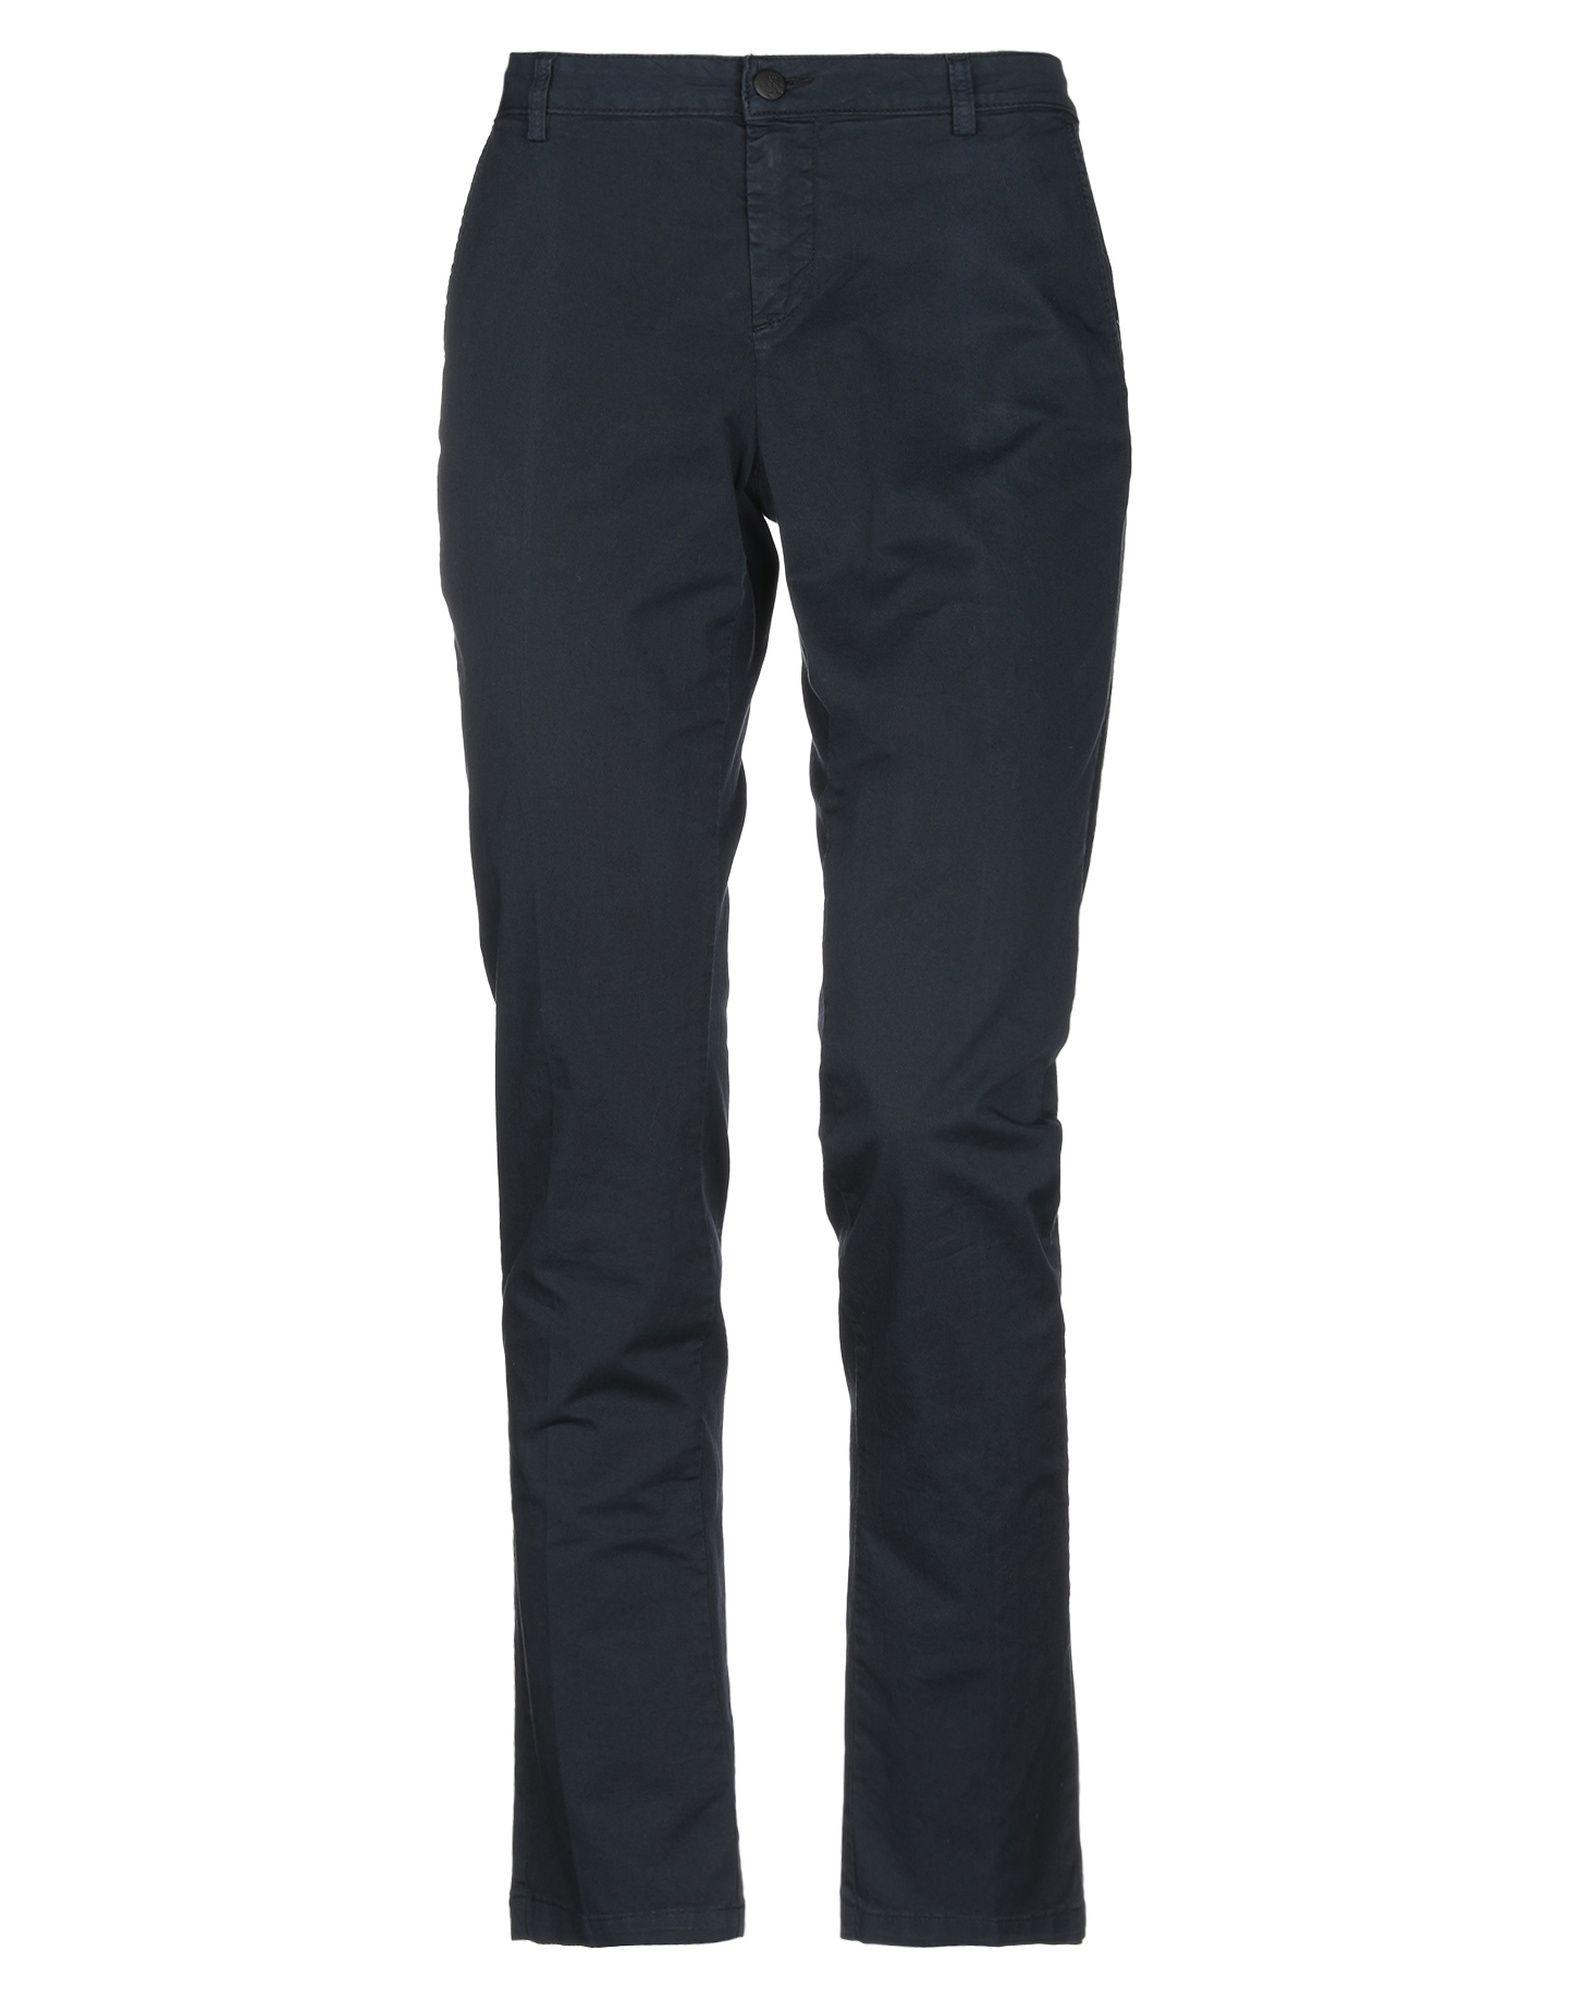 UP ★ JEANS Повседневные брюки rolled up mom jeans